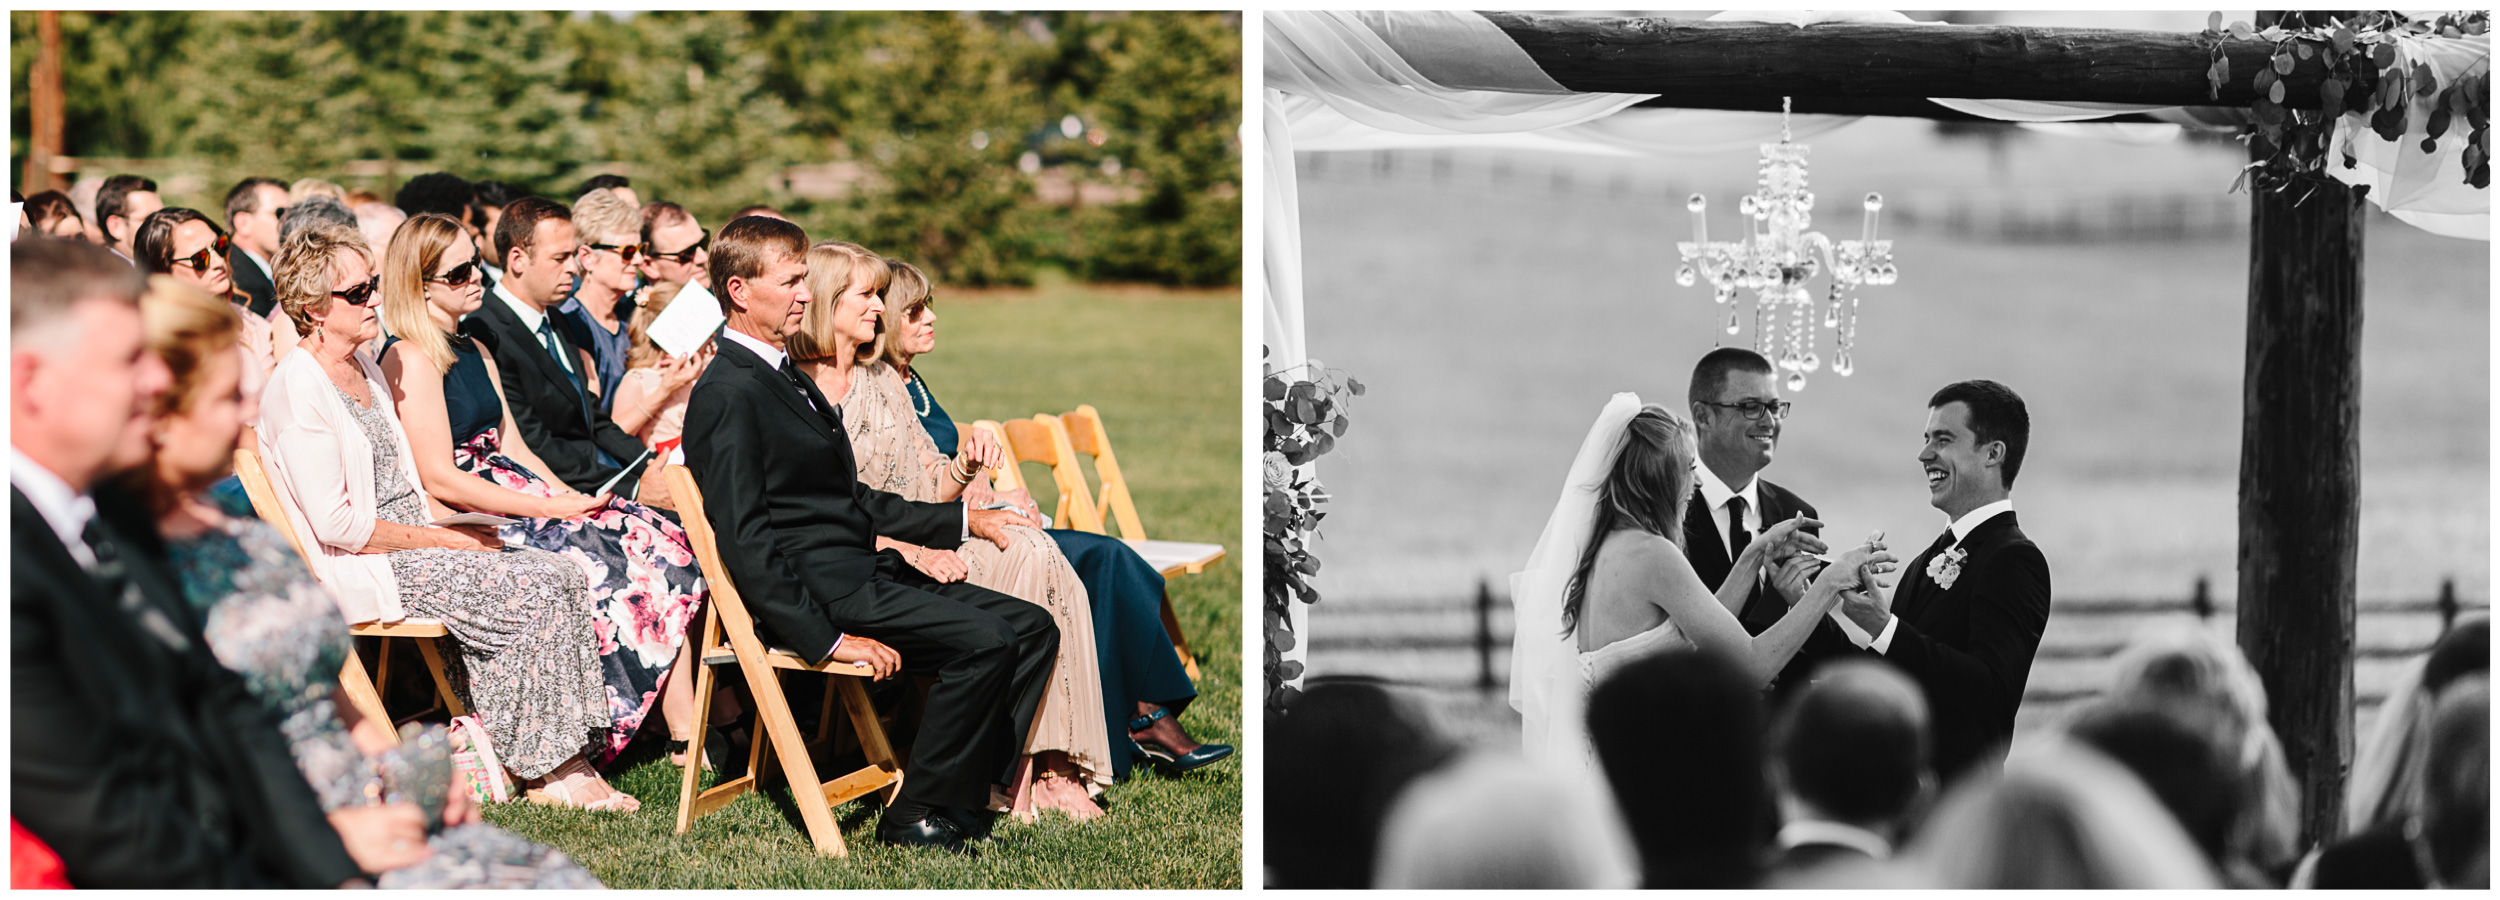 spruce_mountain_ranch_wedding_30.jpg